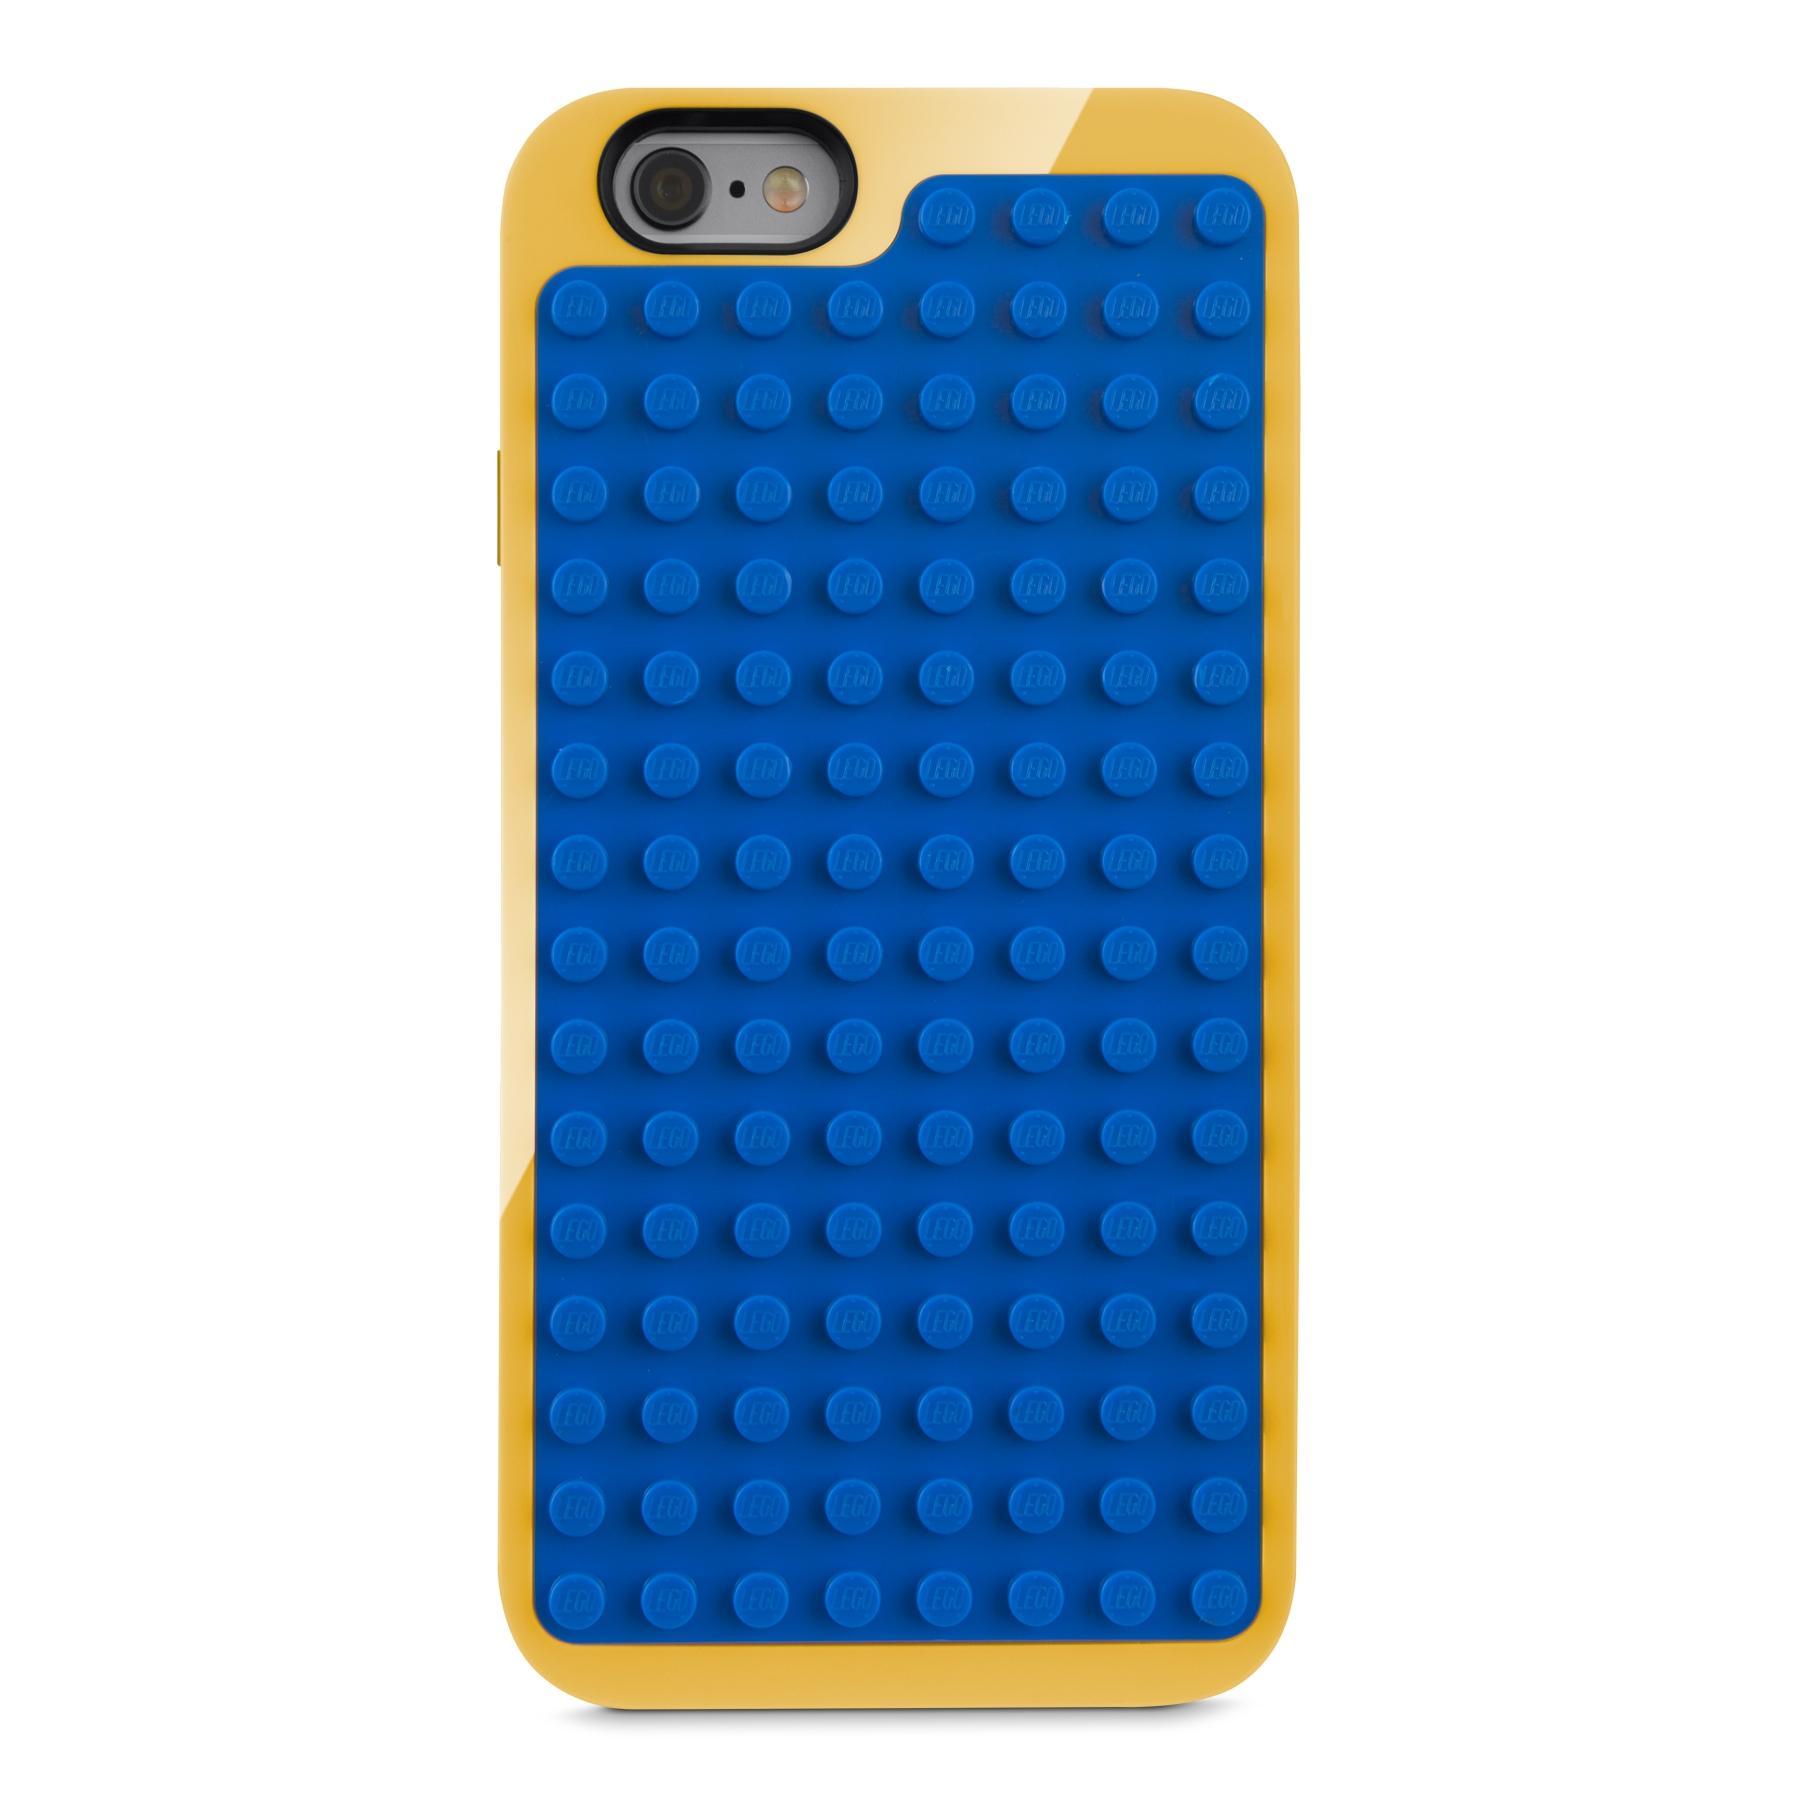 Amazon.com: Belkin Lego Builder IPhone 6 Plus Case